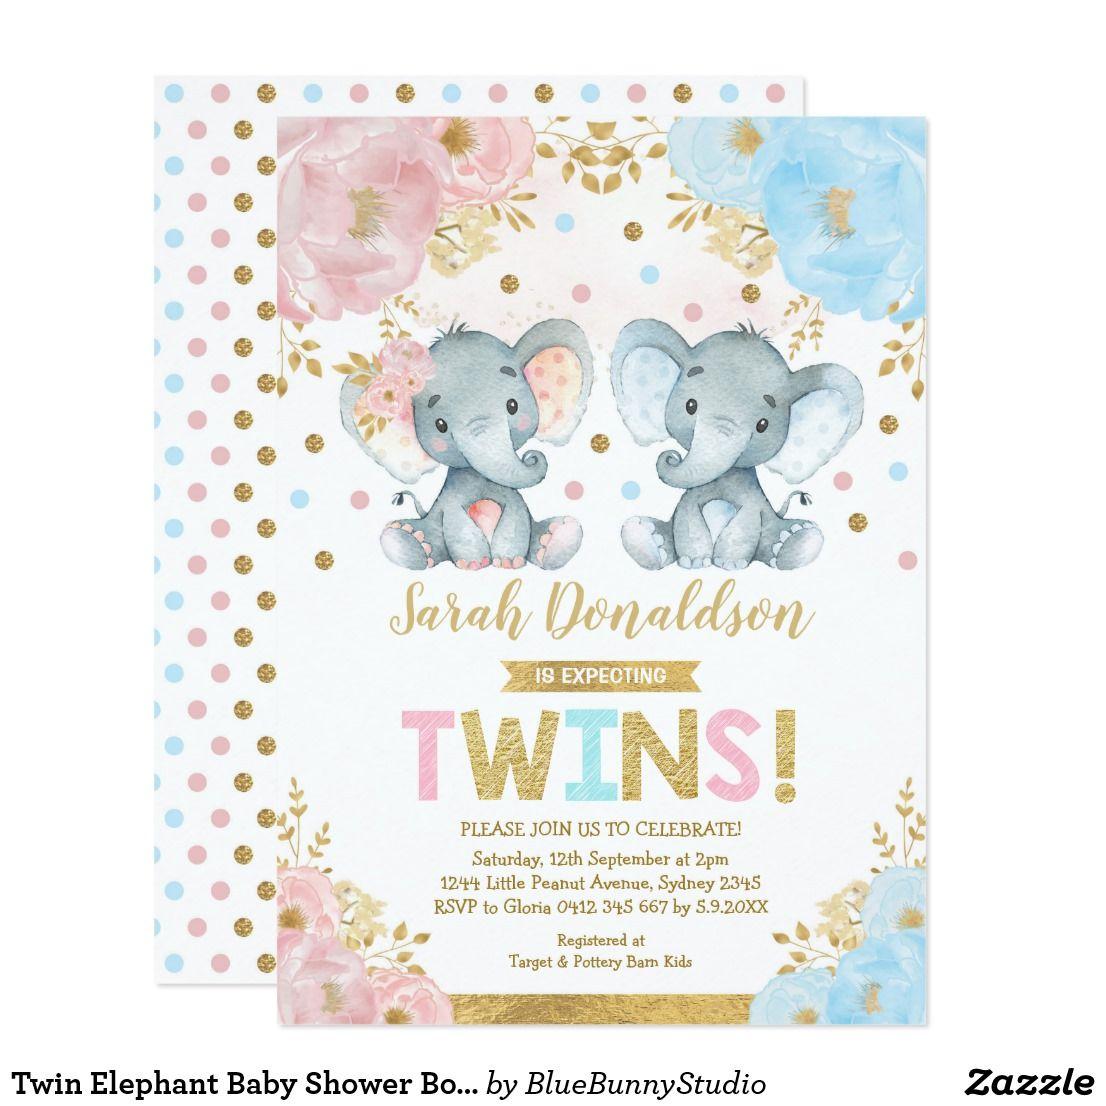 Twin Elephant Baby Shower Boy Girl Twins Invitation Zazzle Com Elephant Baby Shower Boy Twin Girls Baby Shower Elephant Baby Shower Invitations